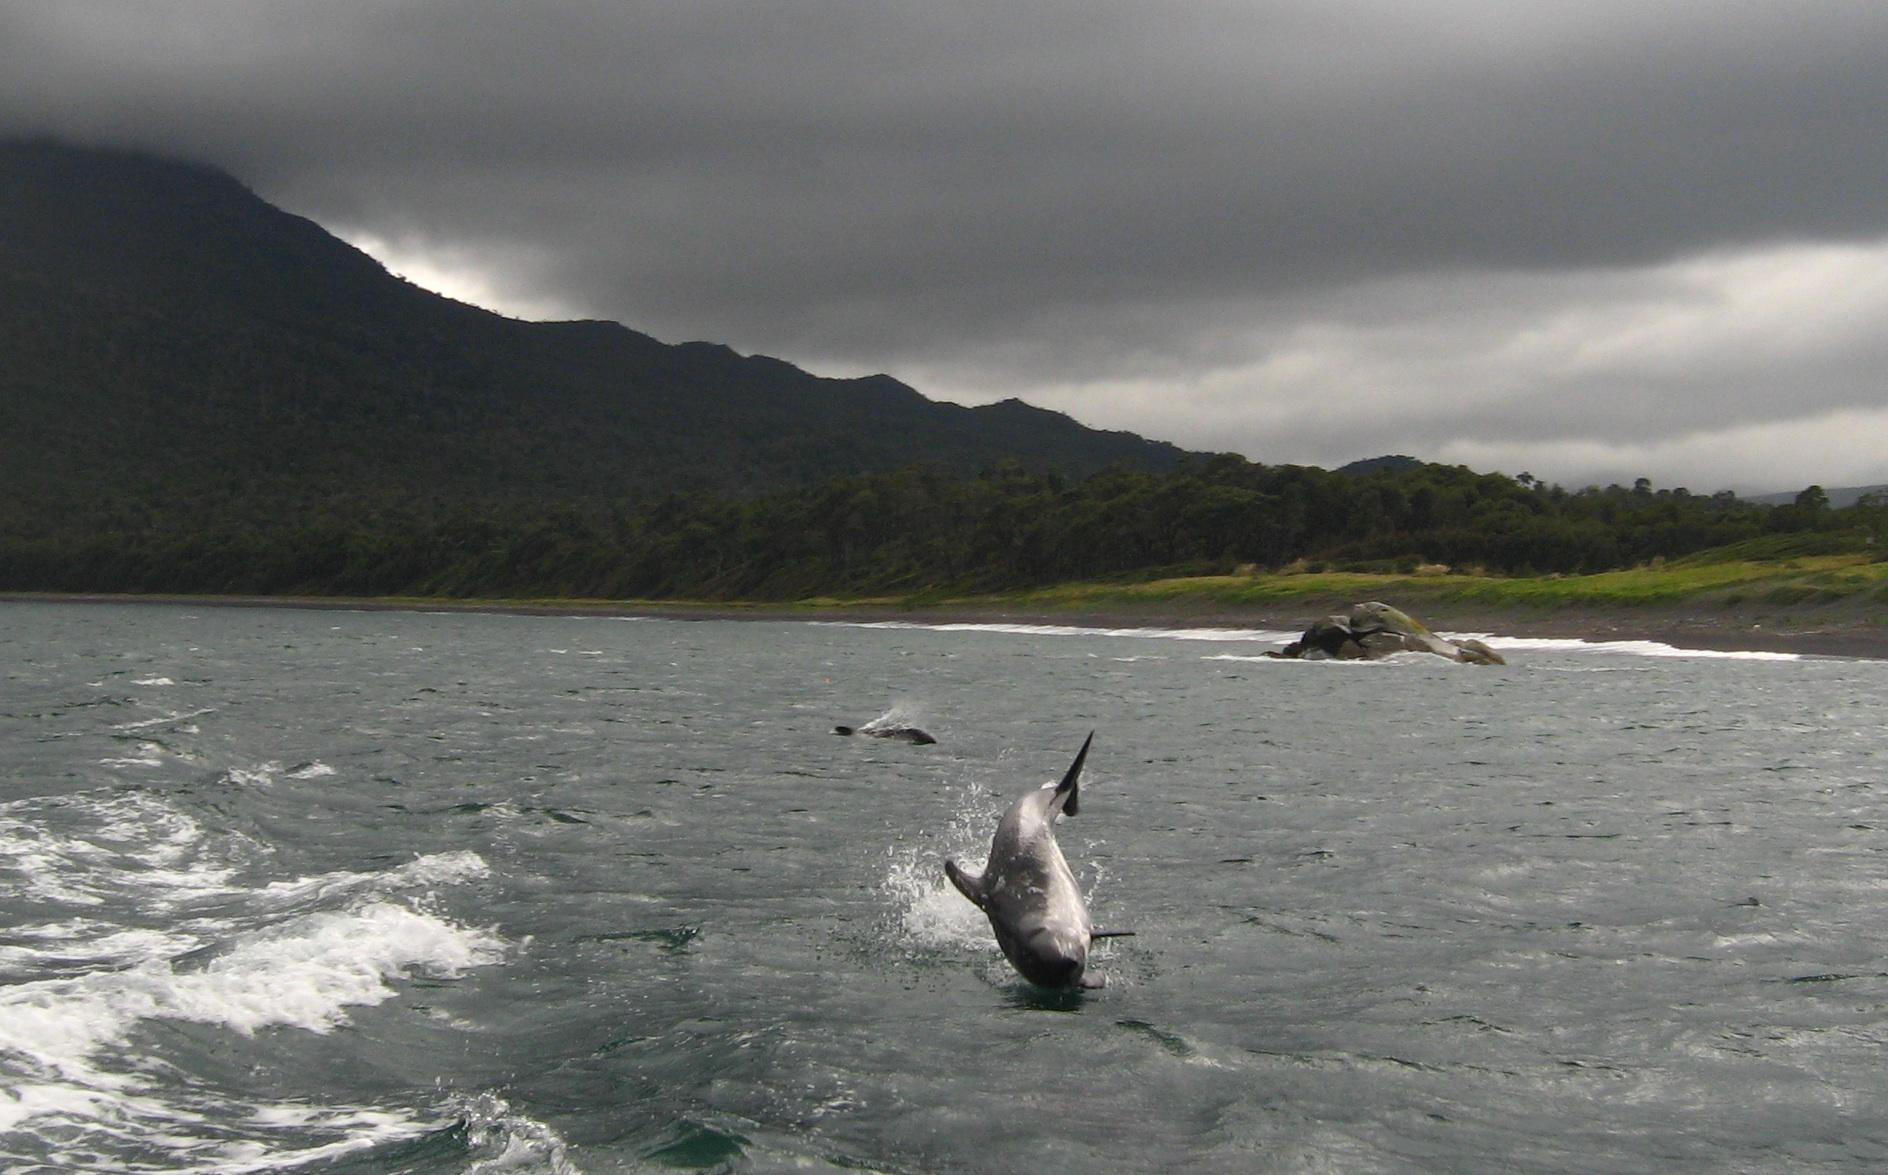 Toninas Dolfin Turismo aventura Patagonia Chile